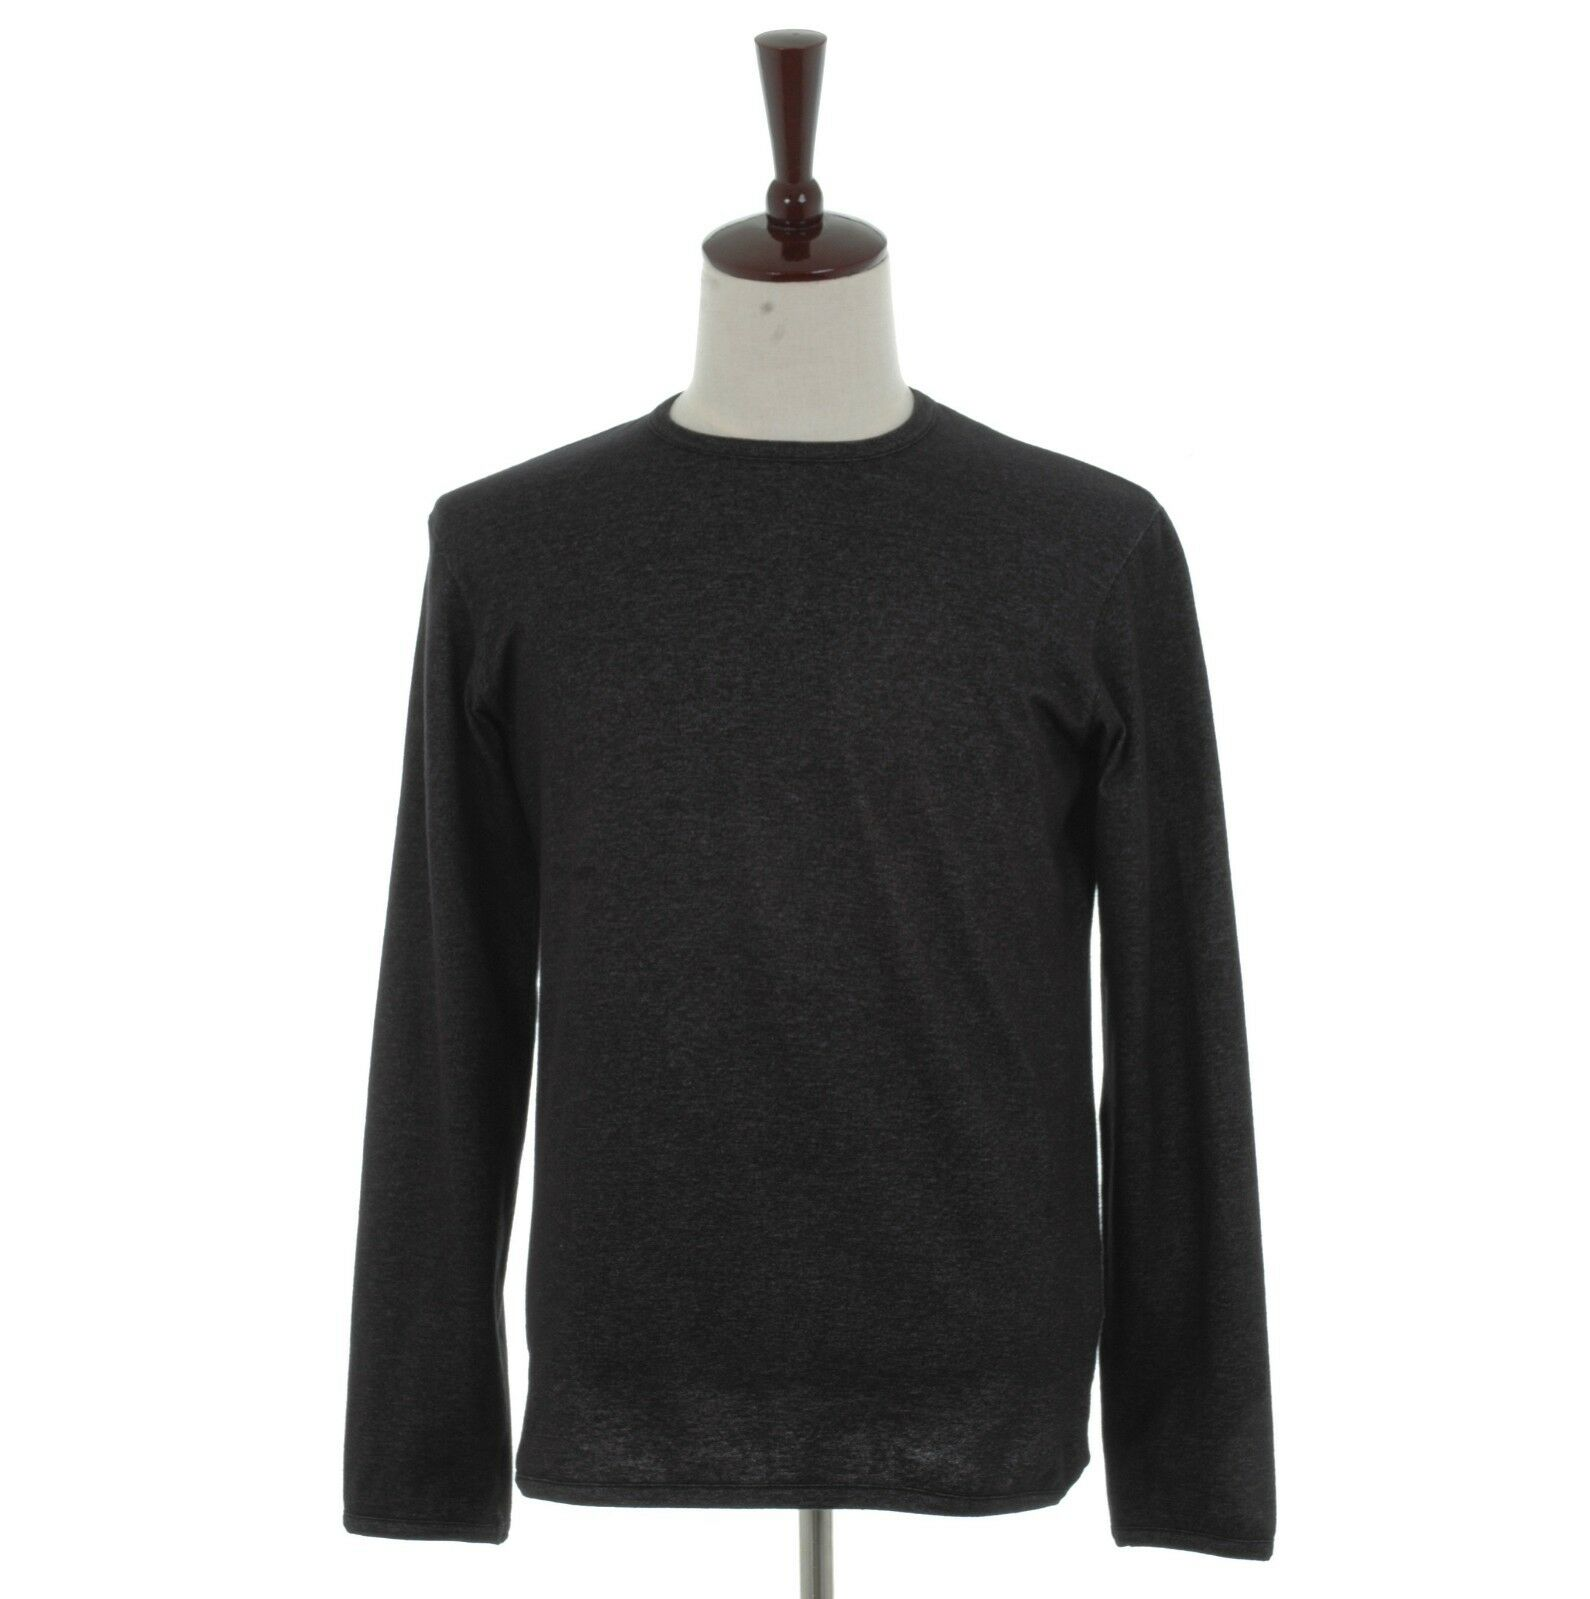 Yohji Yamamoto Y's for men sweater (001-028)